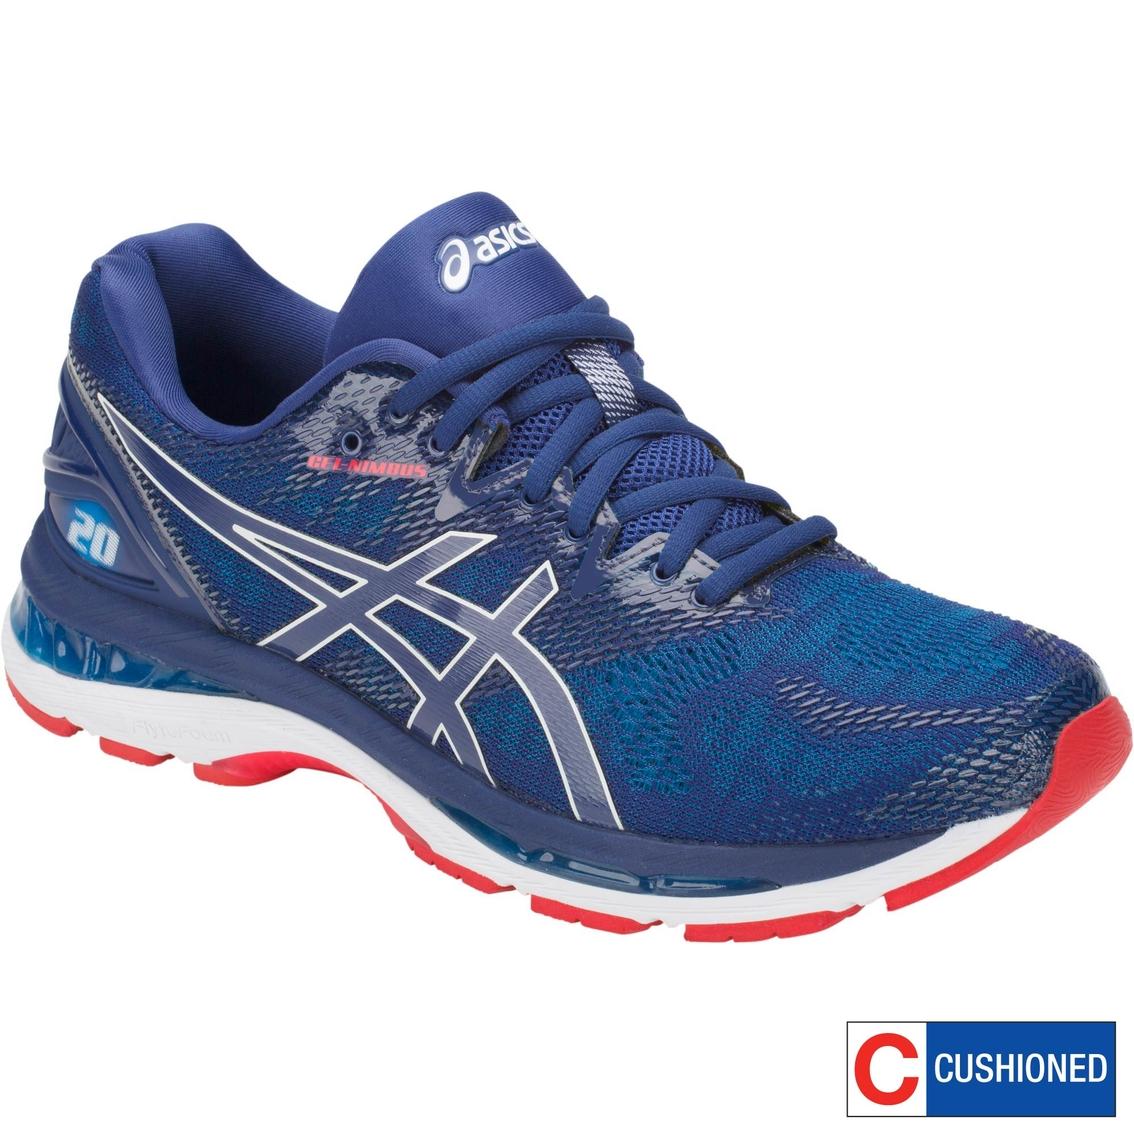 9b690b8ff56 Asics Men s Gel-nimbus 20 Athletic Shoes